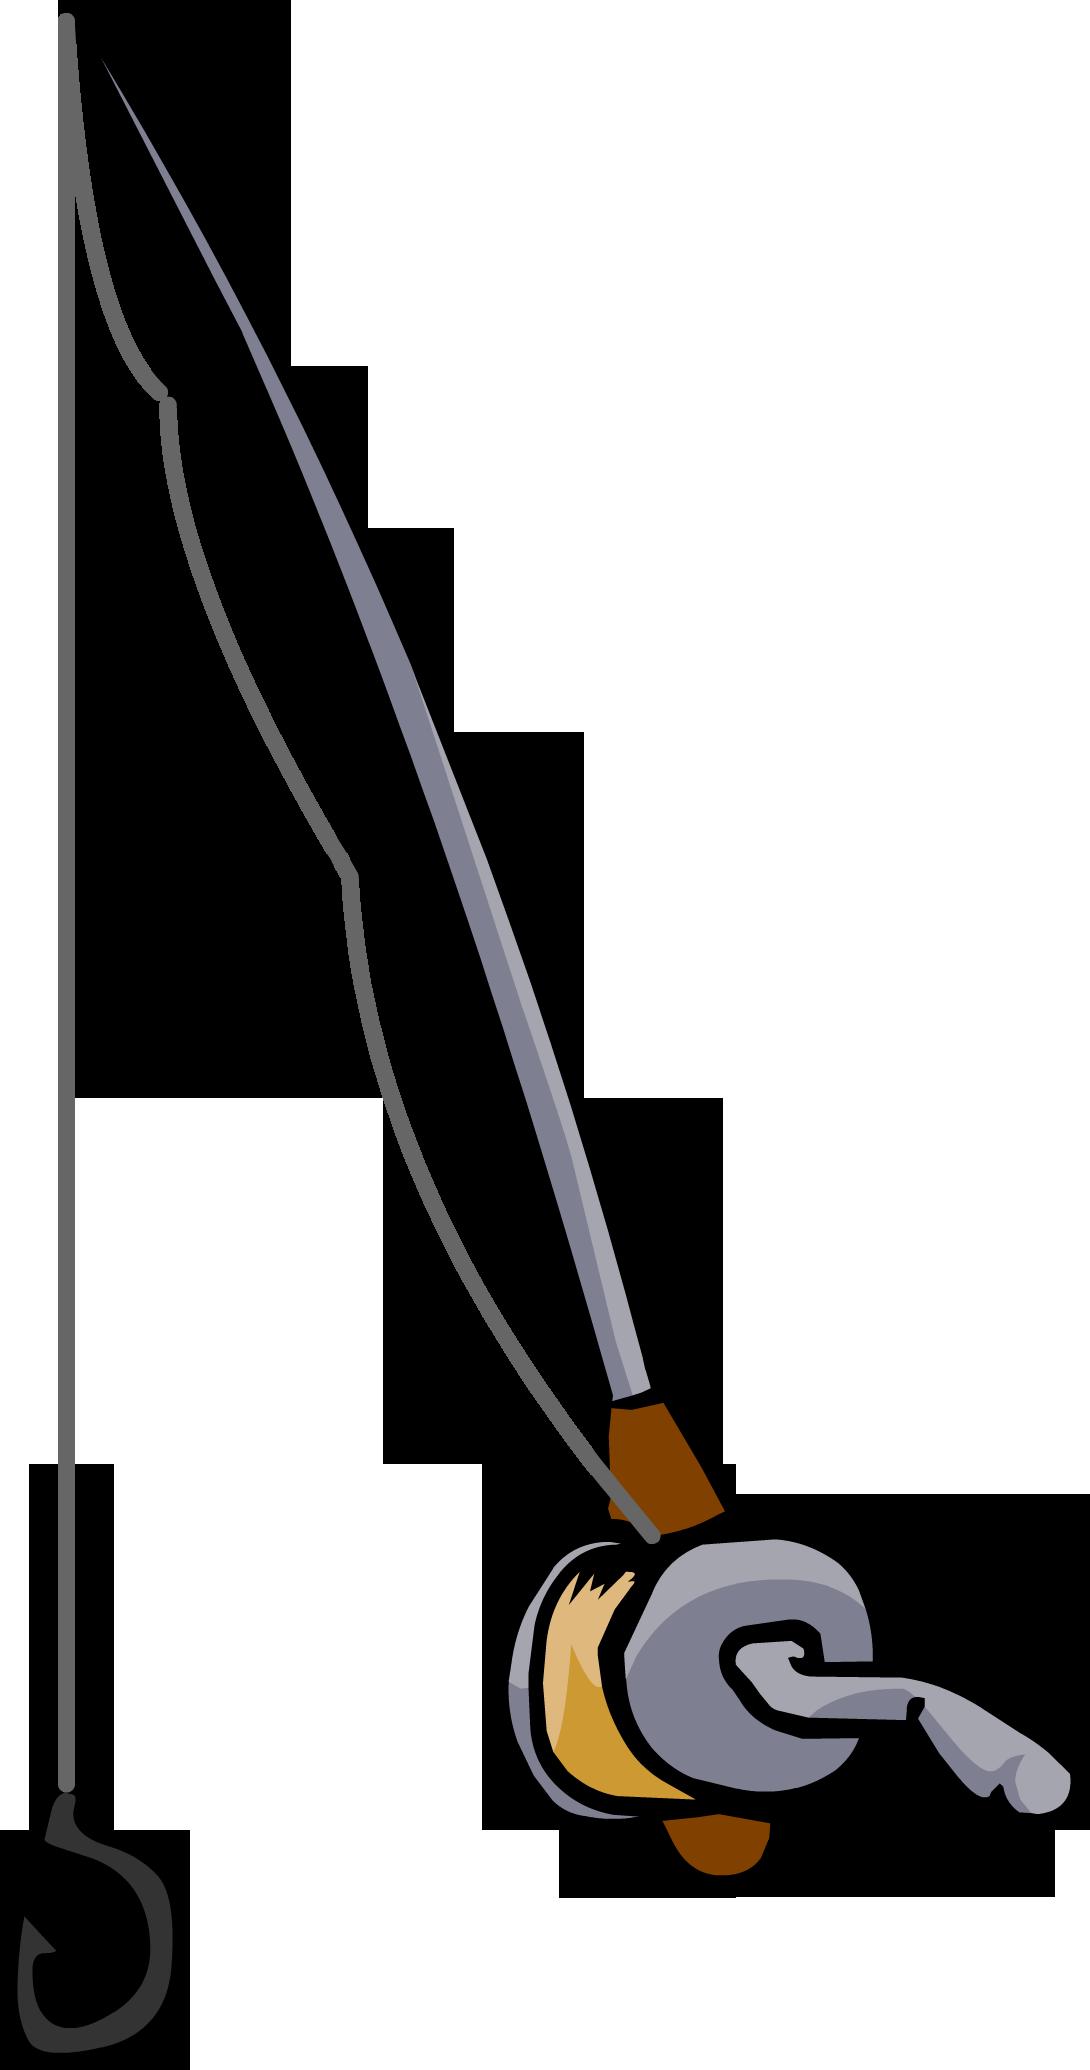 Lines clipart fishing pole Fishing Penguin Club Fandom Fishing